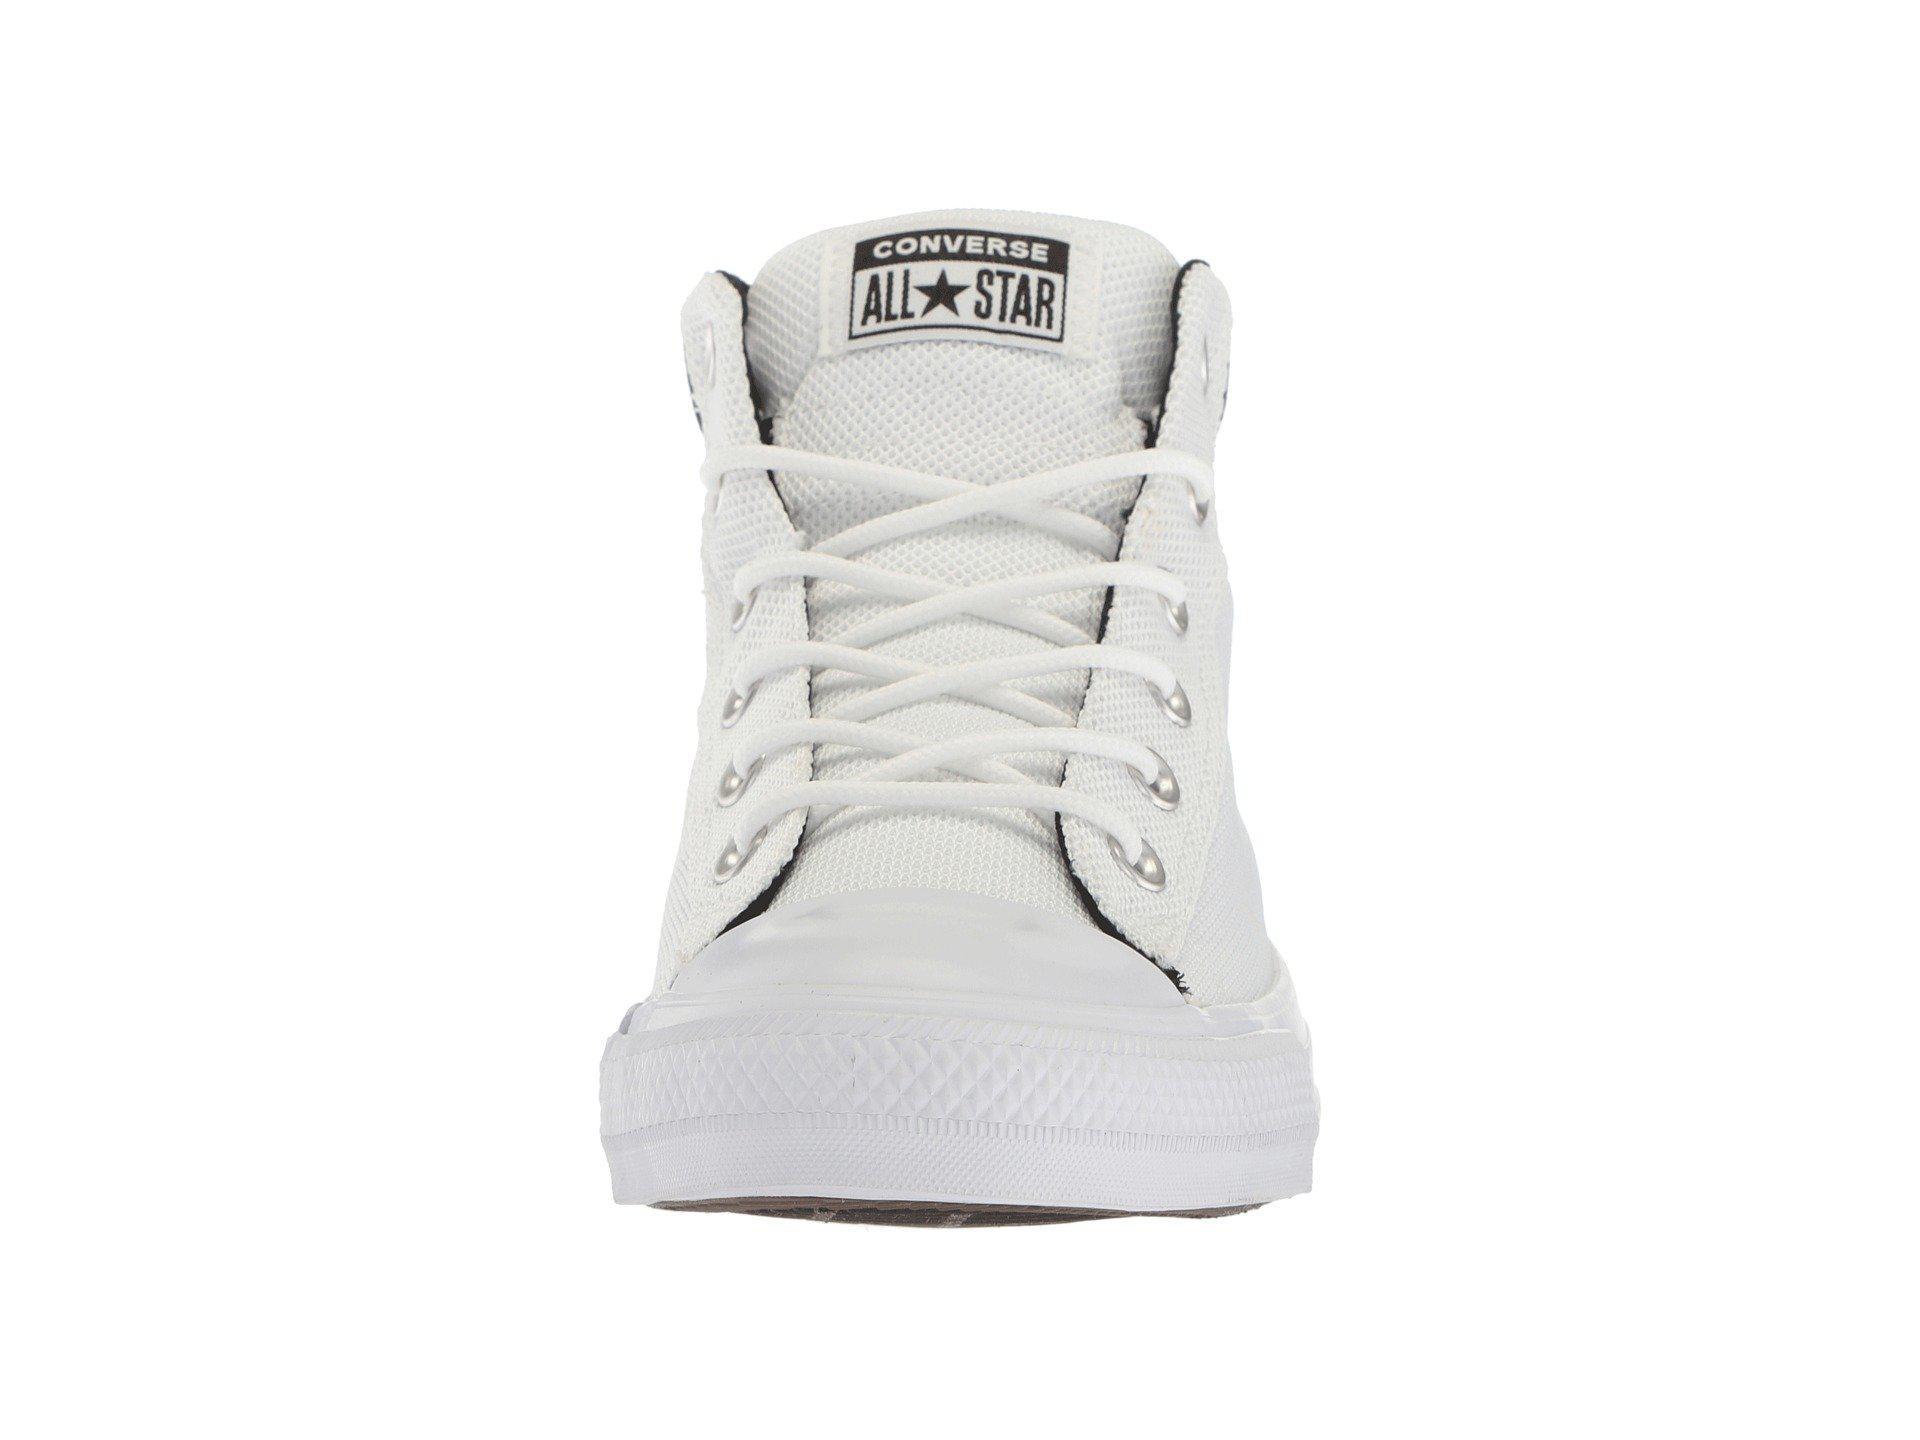 Lyst - Converse Chuck Taylor All Star Street Mid (white black white ... 6b3e891d8